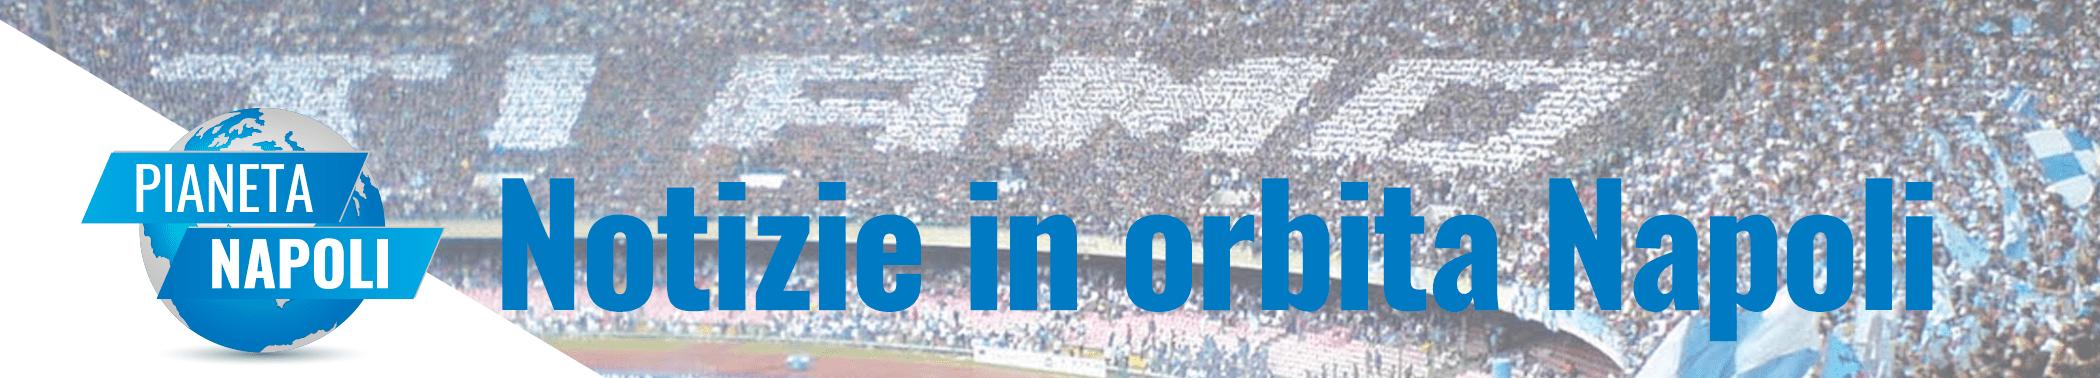 Pianeta Napoli. Notizie in Orbita Napoli